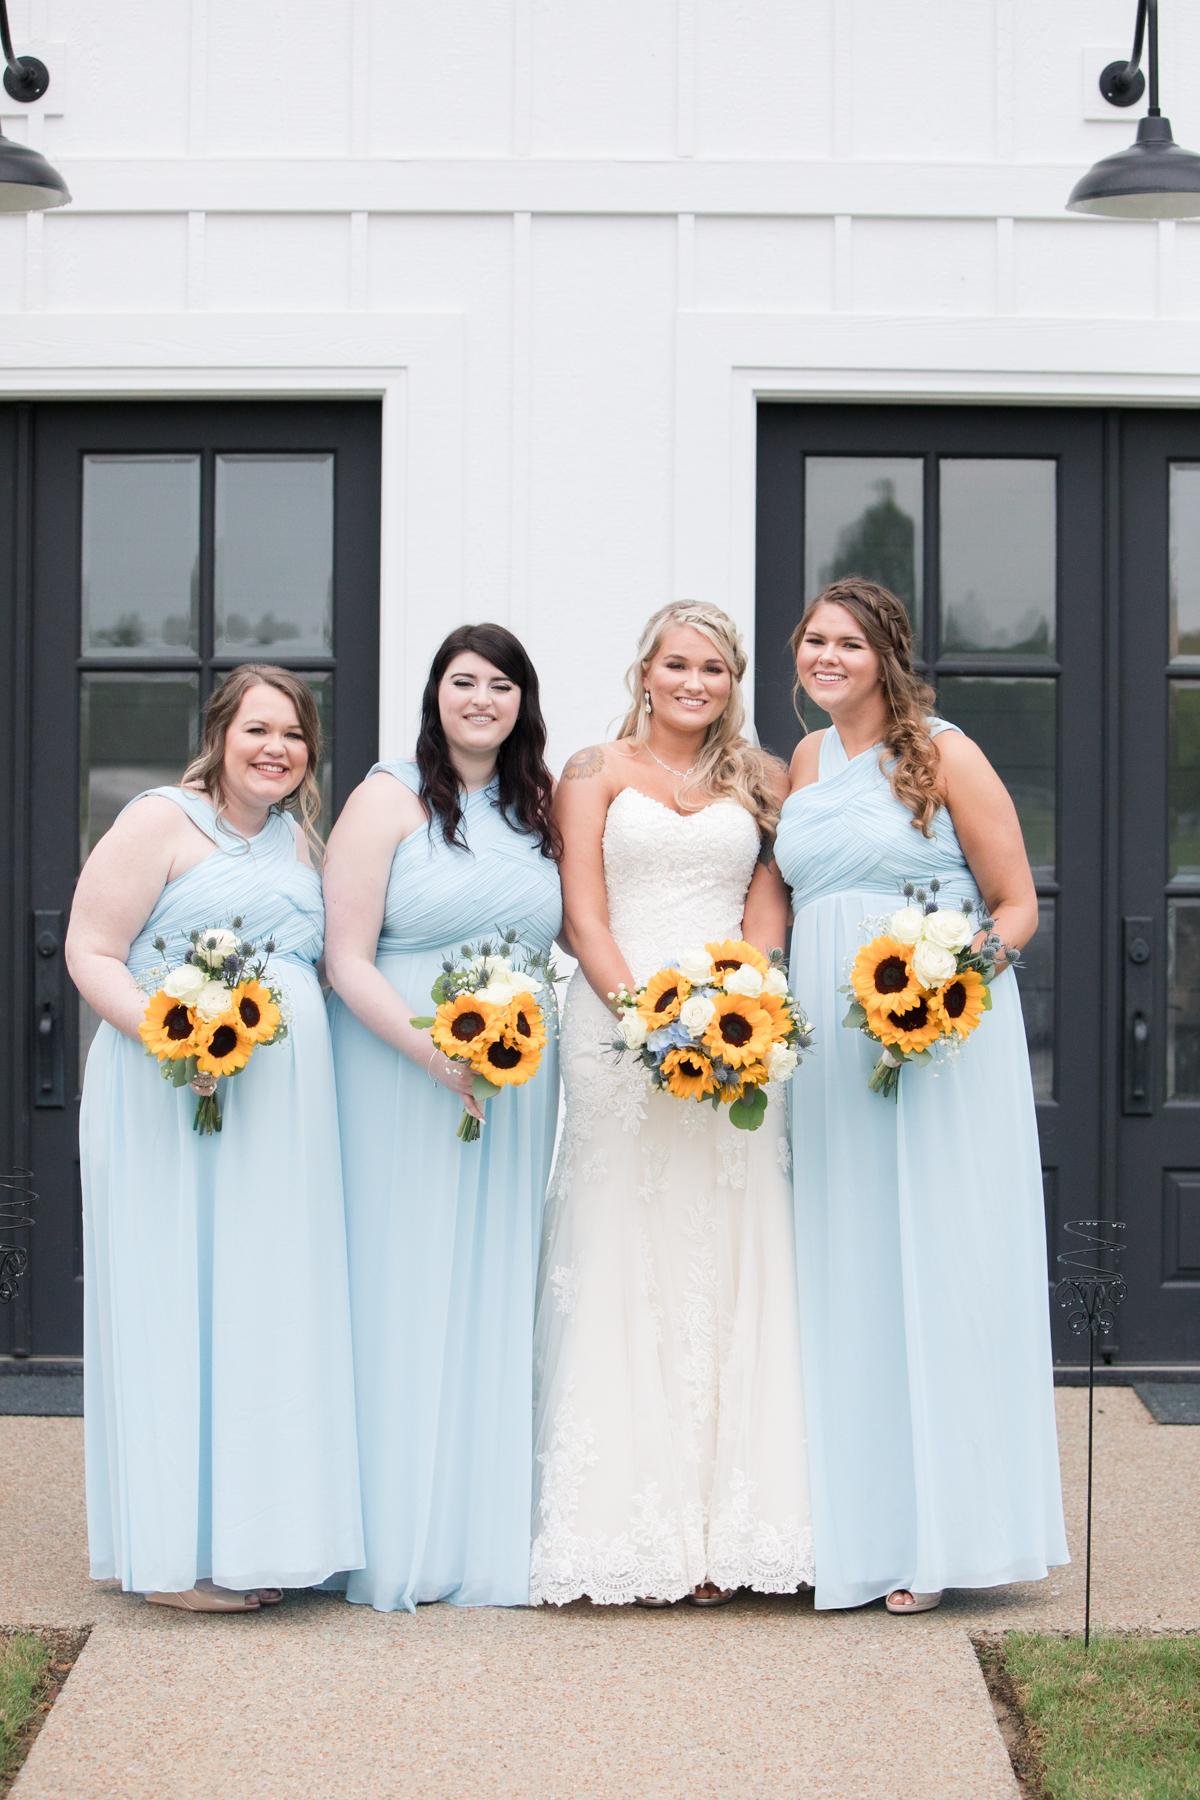 The-venue-at-white-oak-farms-wedding-nashville-wedding-photographers-0116.jpg